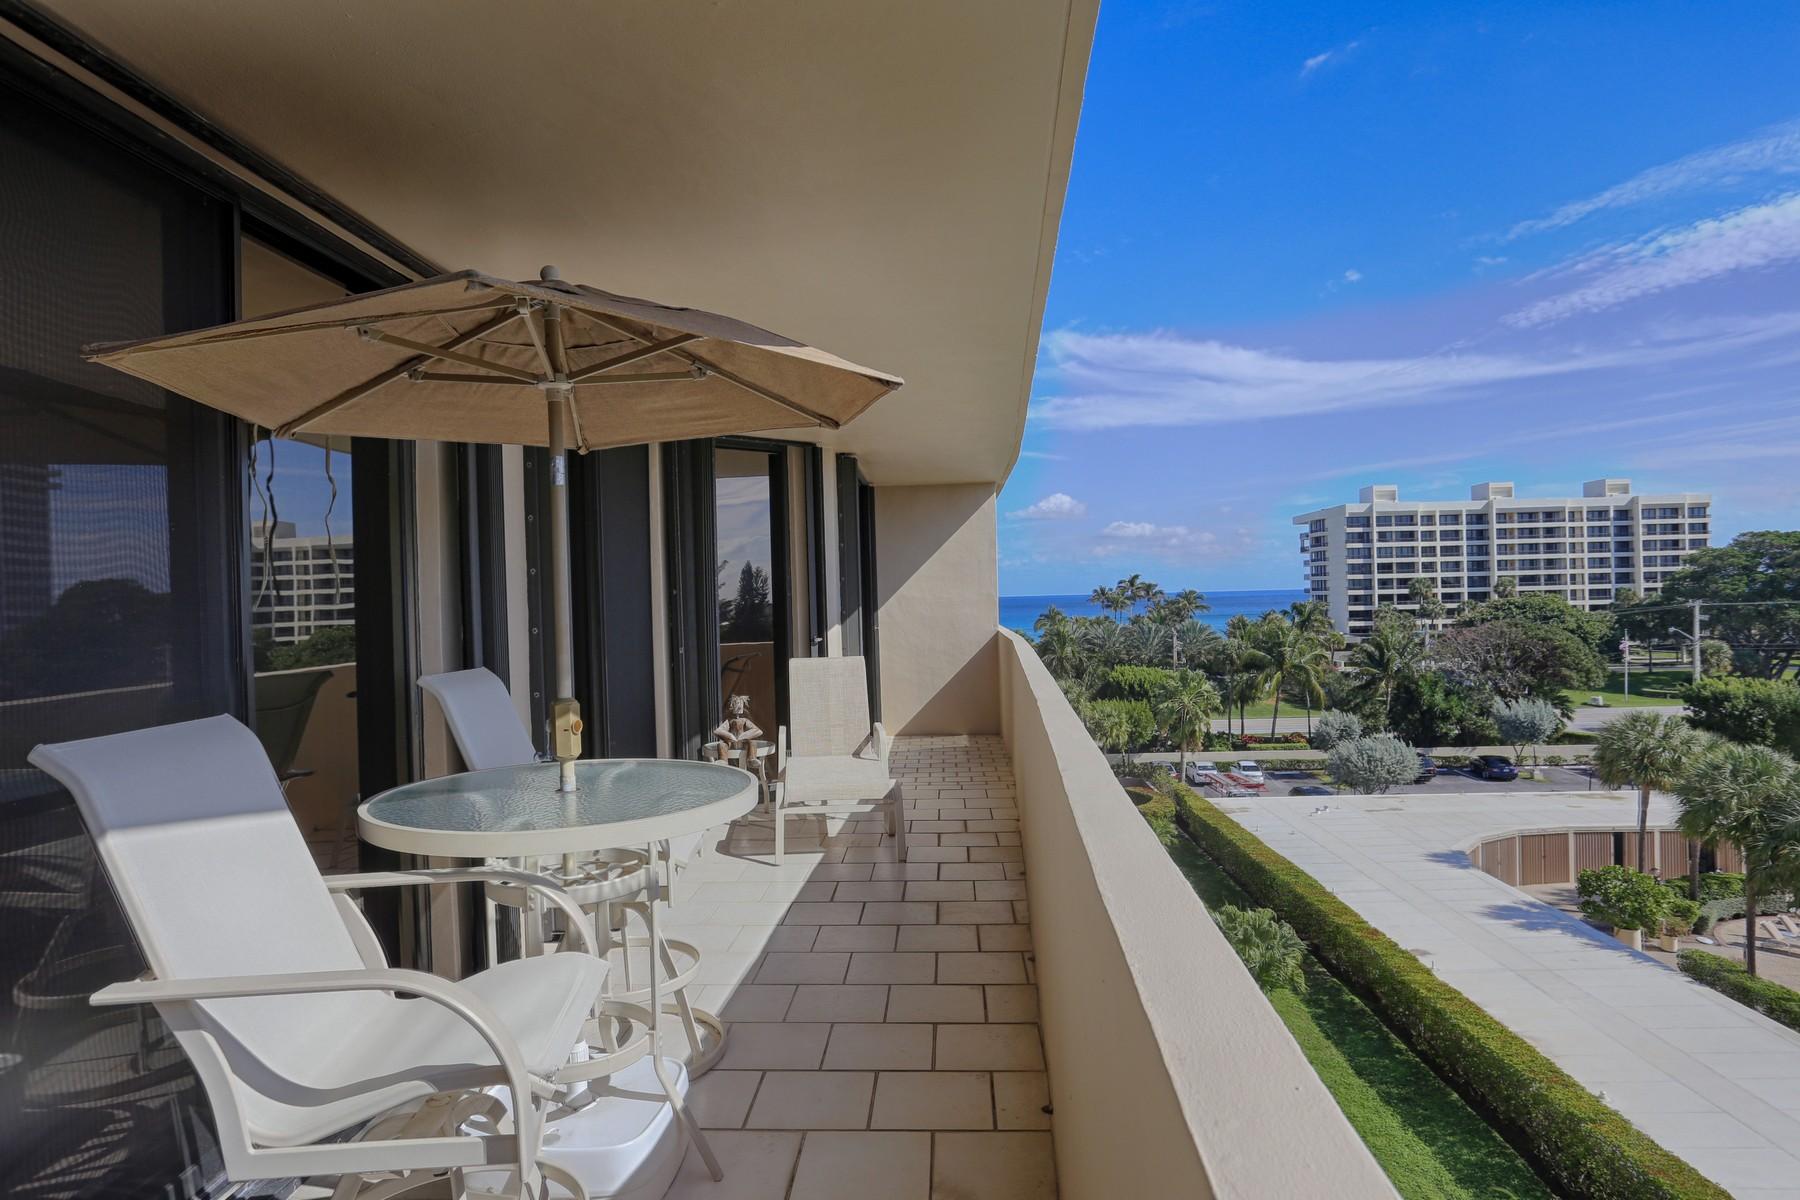 sales property at 1401 S Ocean Blvd S, 504, Boca Raton, FL 33432